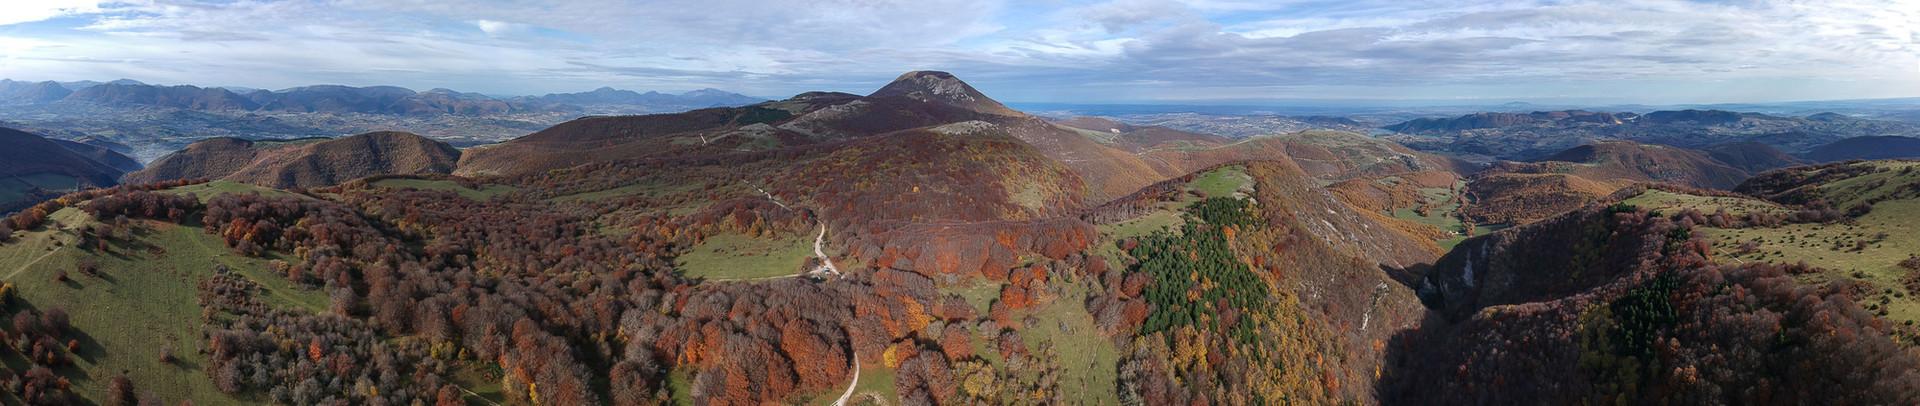 Monte San Vicino e Foresta di Canfaito